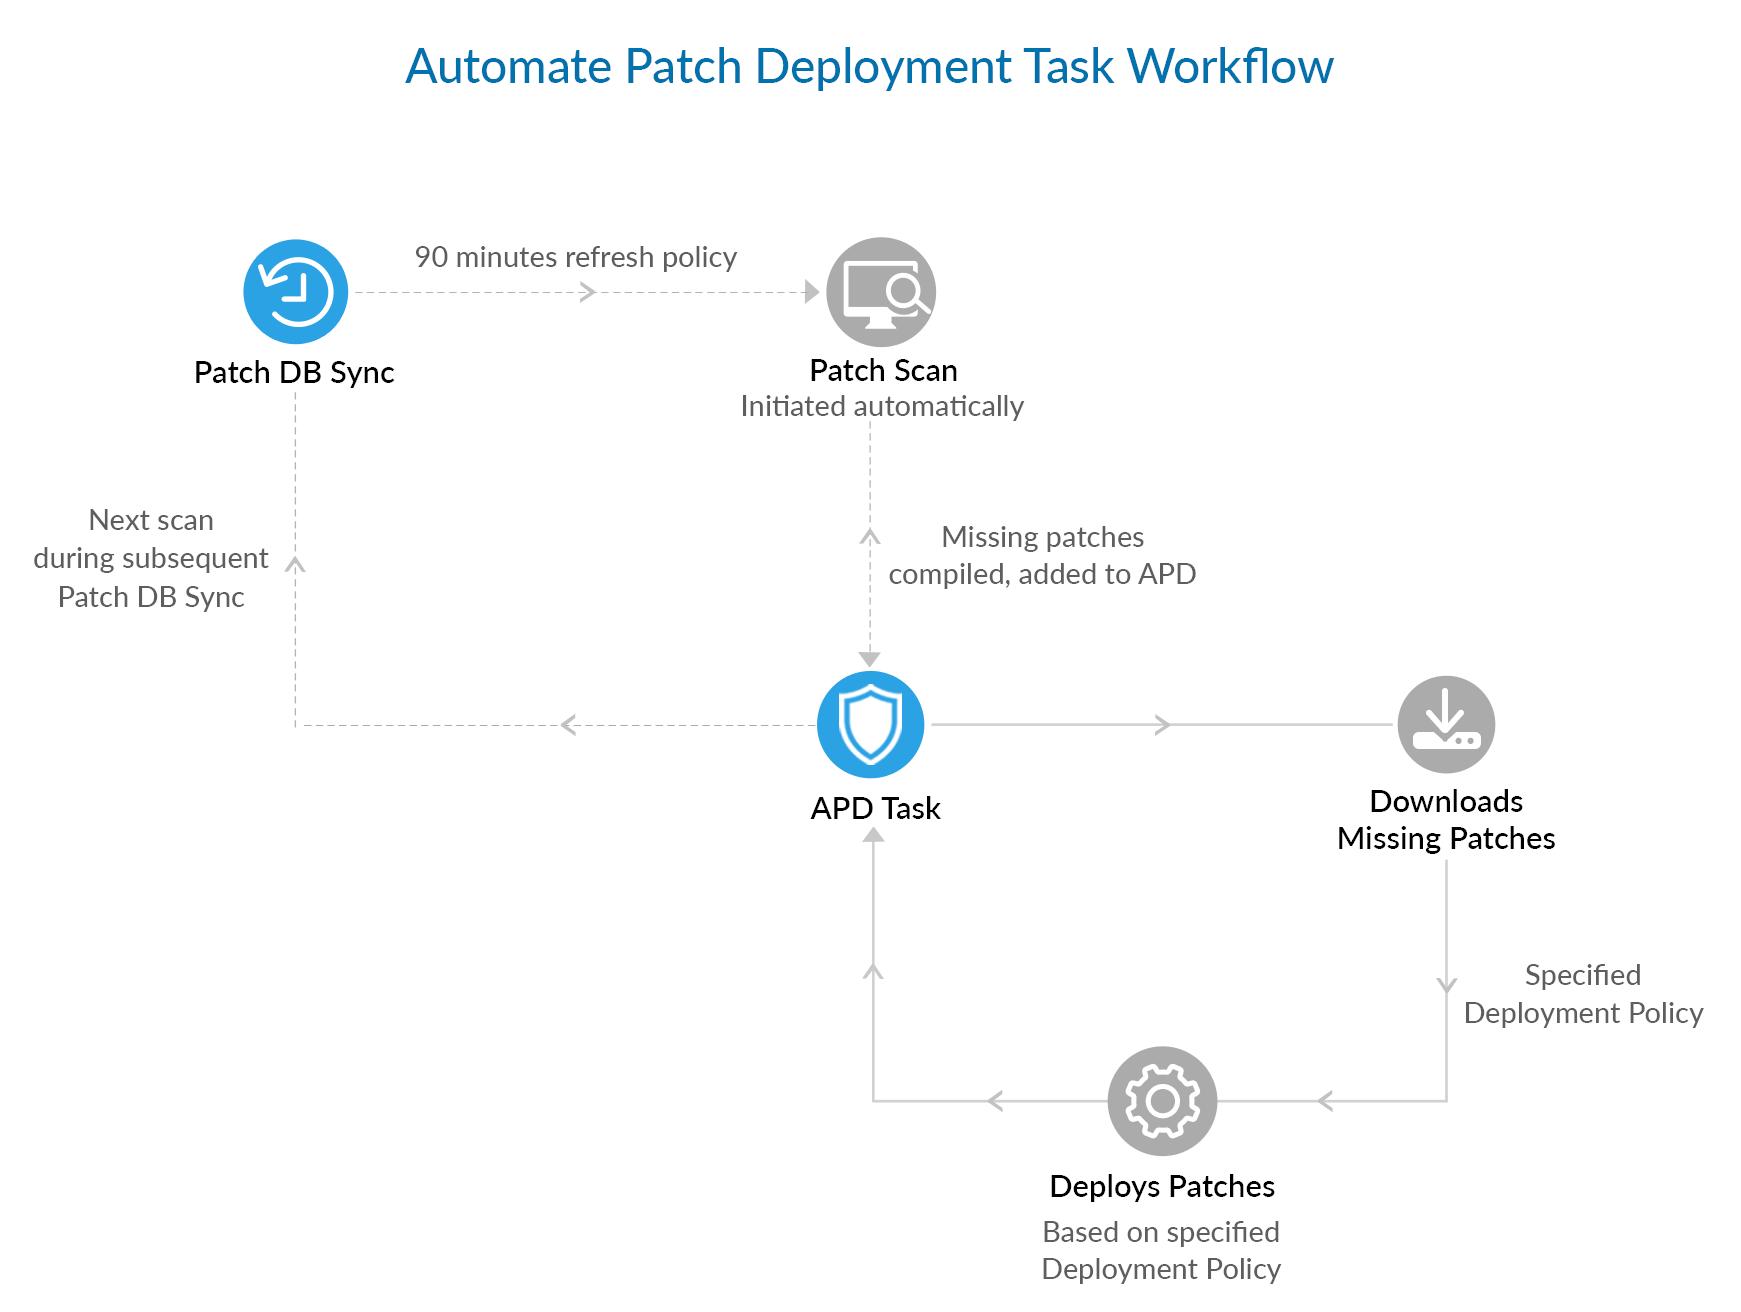 Automatepatchdeploymentworkflow